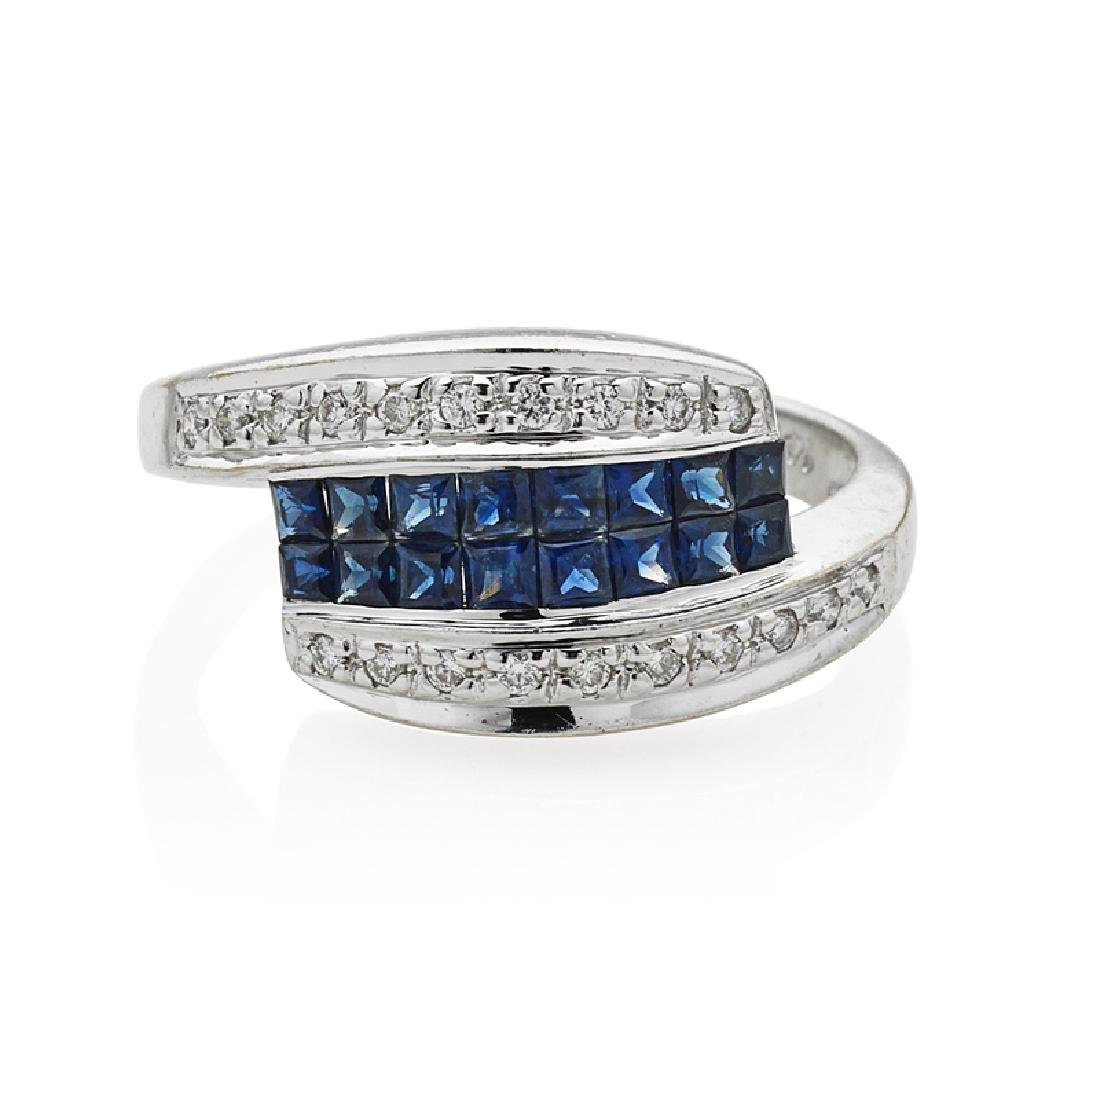 DIAMOND, SAPPHIRE & WHITE GOLD RING